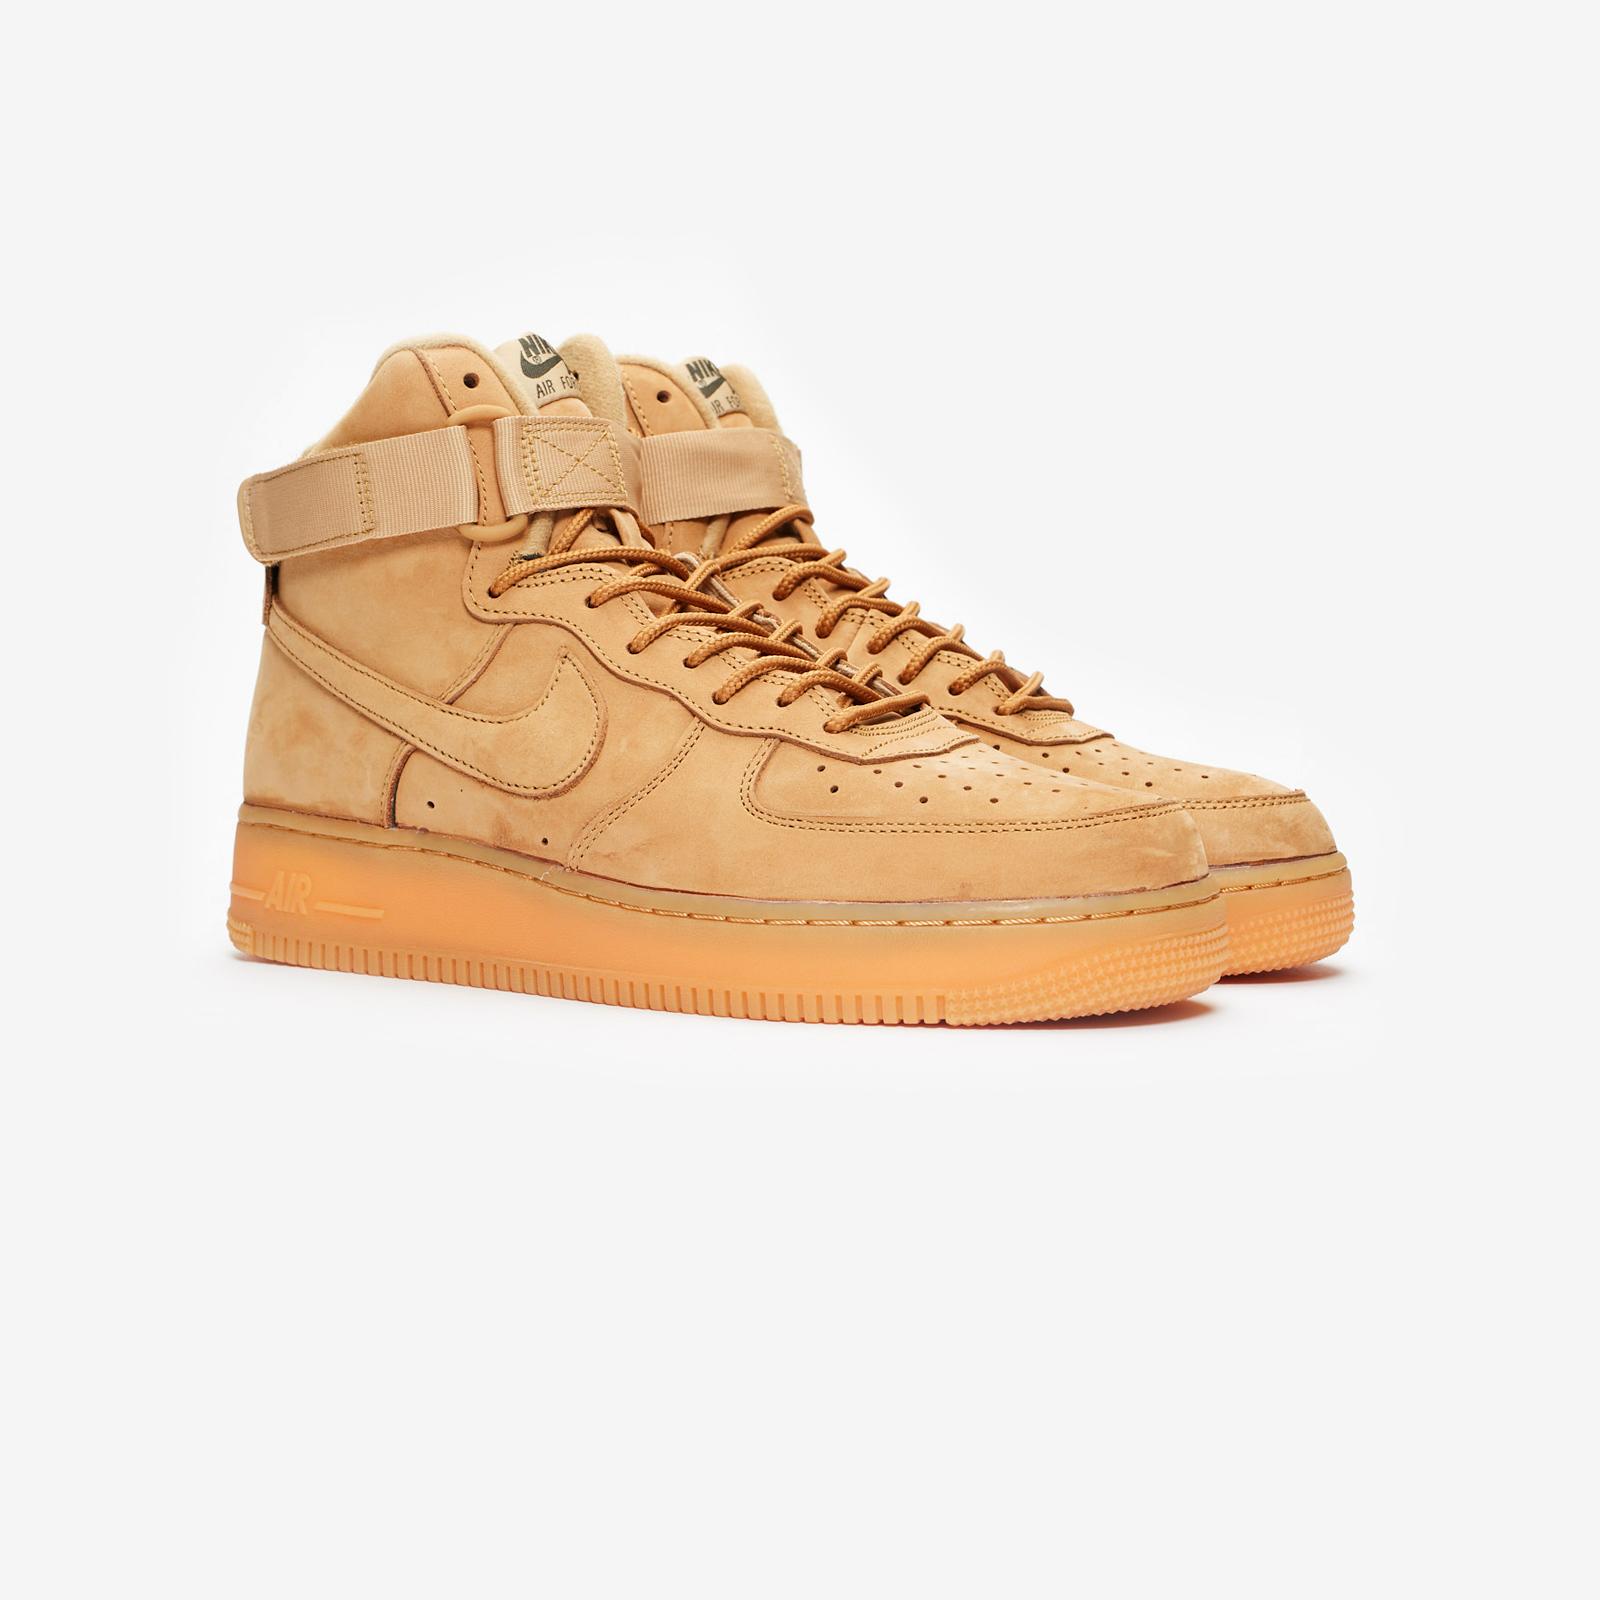 premium selection 237ca 360b3 Nike Air Force 1 High 07 LV8 WB